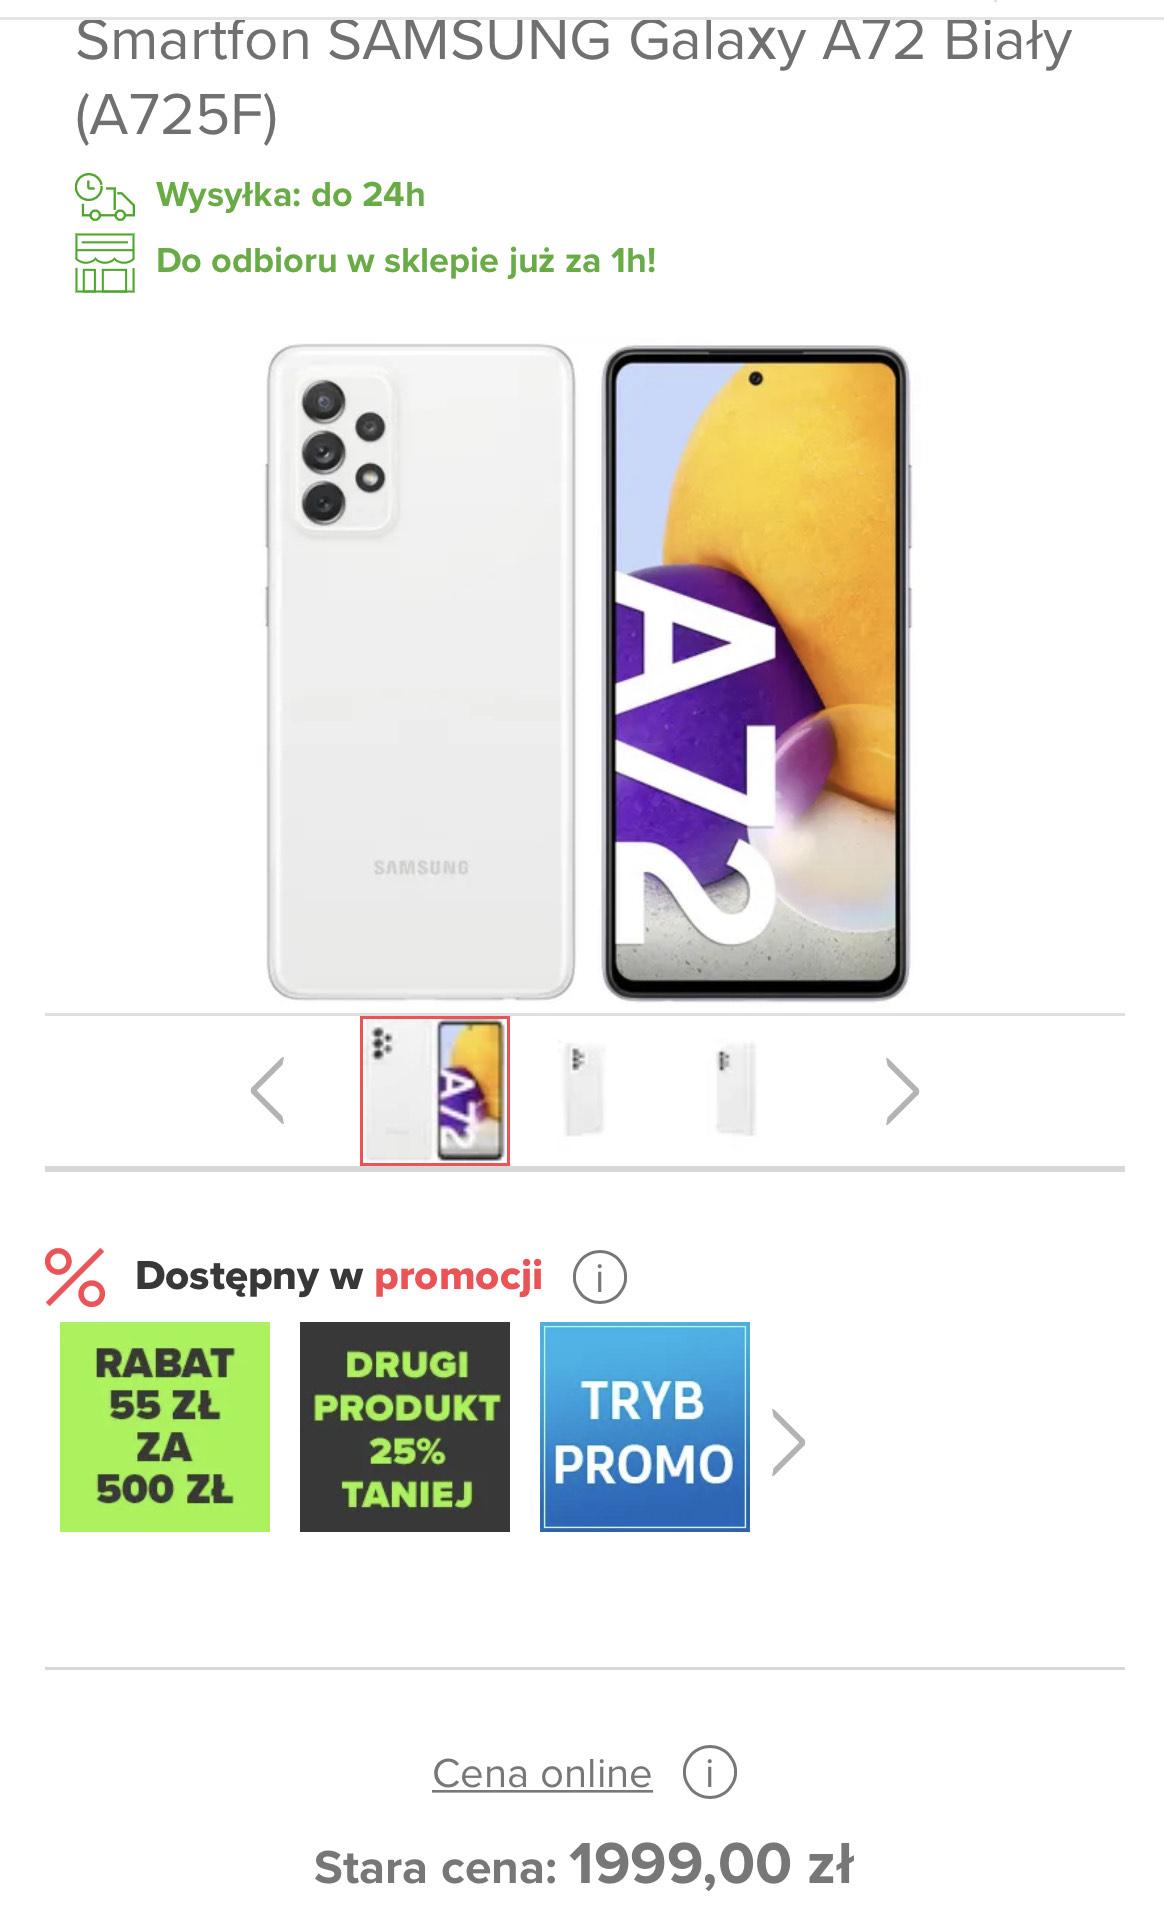 Smartfon SAMSUNG Galaxy A72 Biały